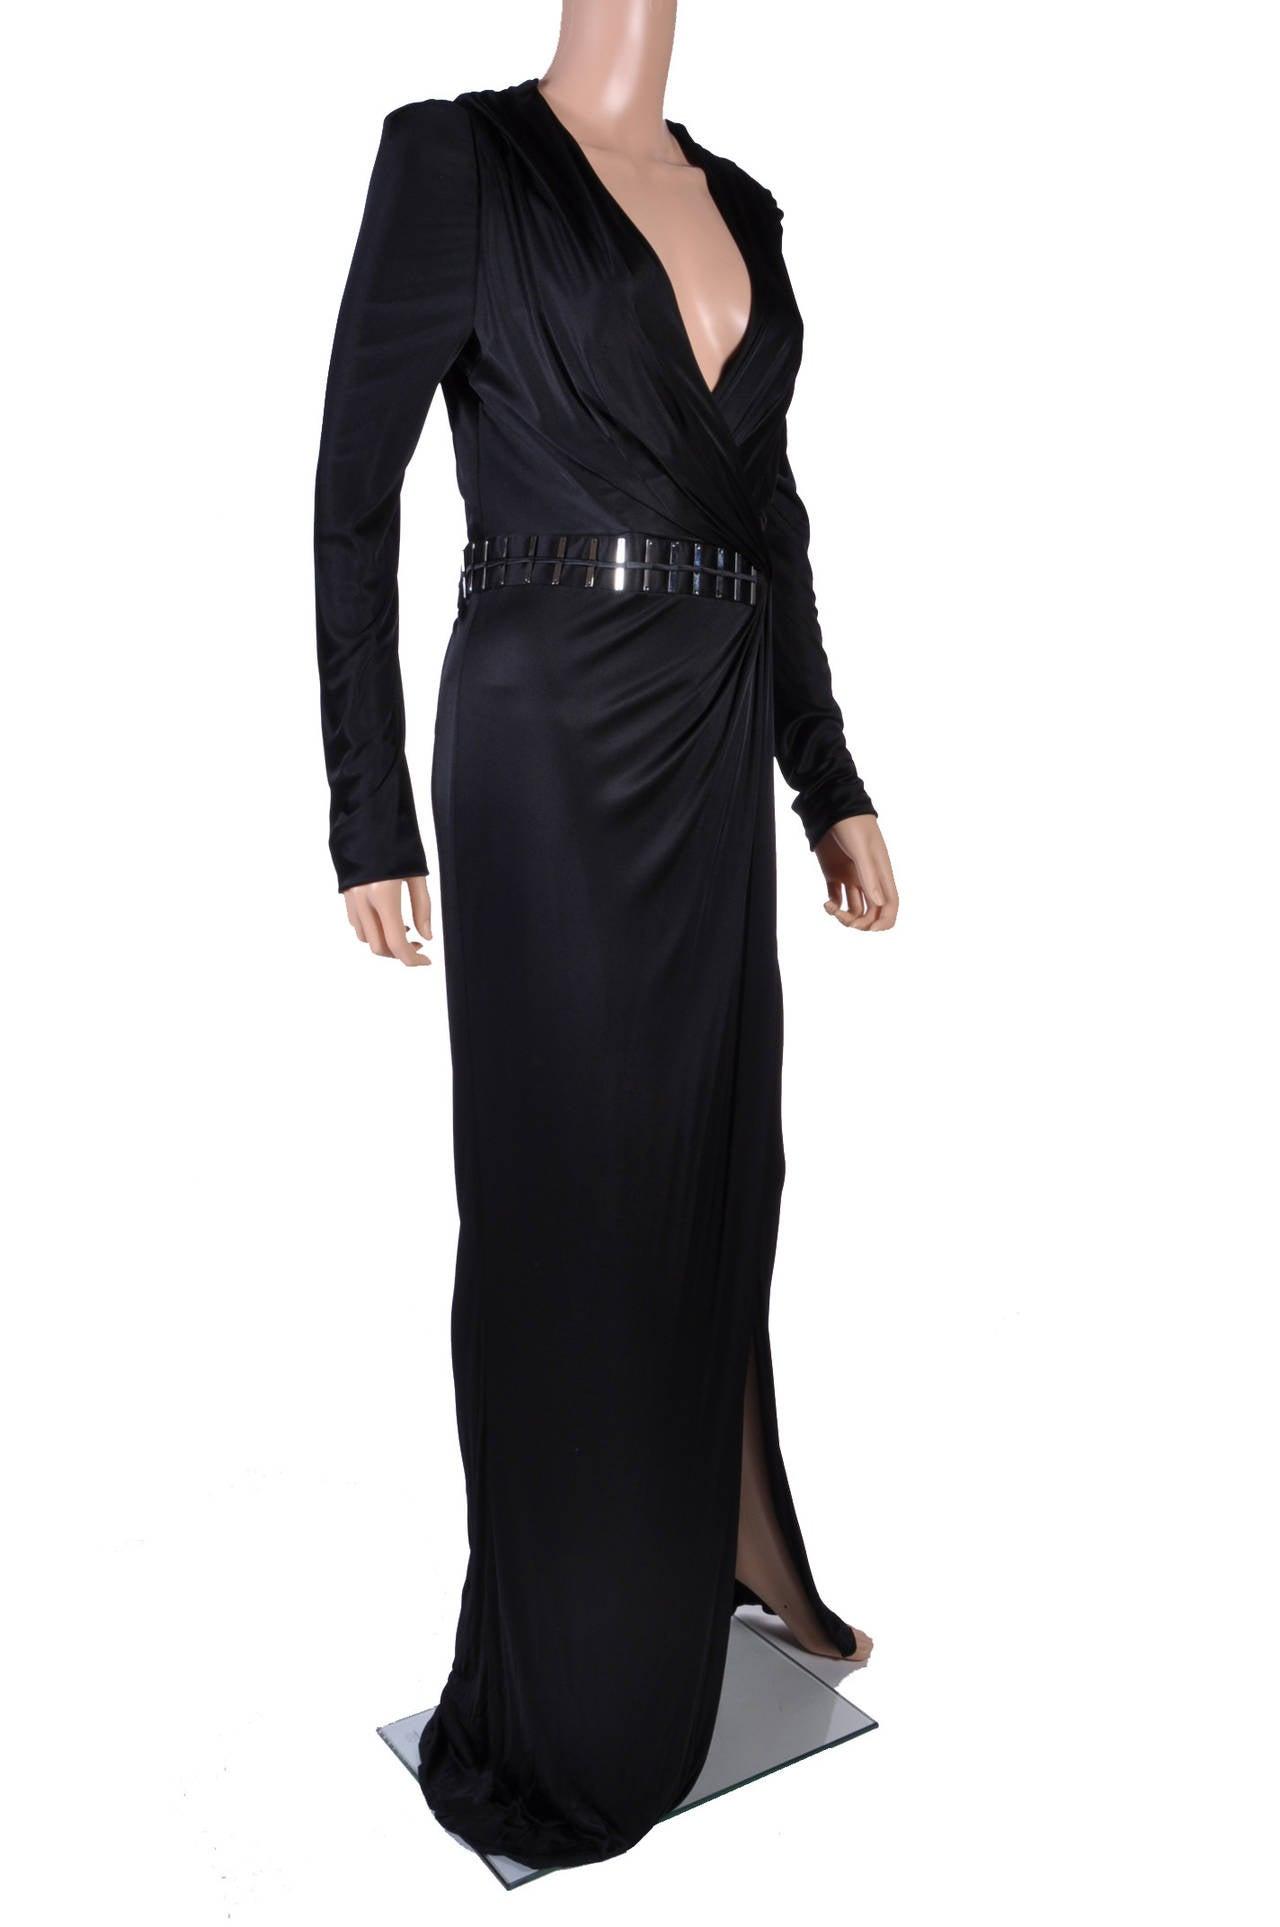 New VERSACE BLACK WRAP DRESS 2